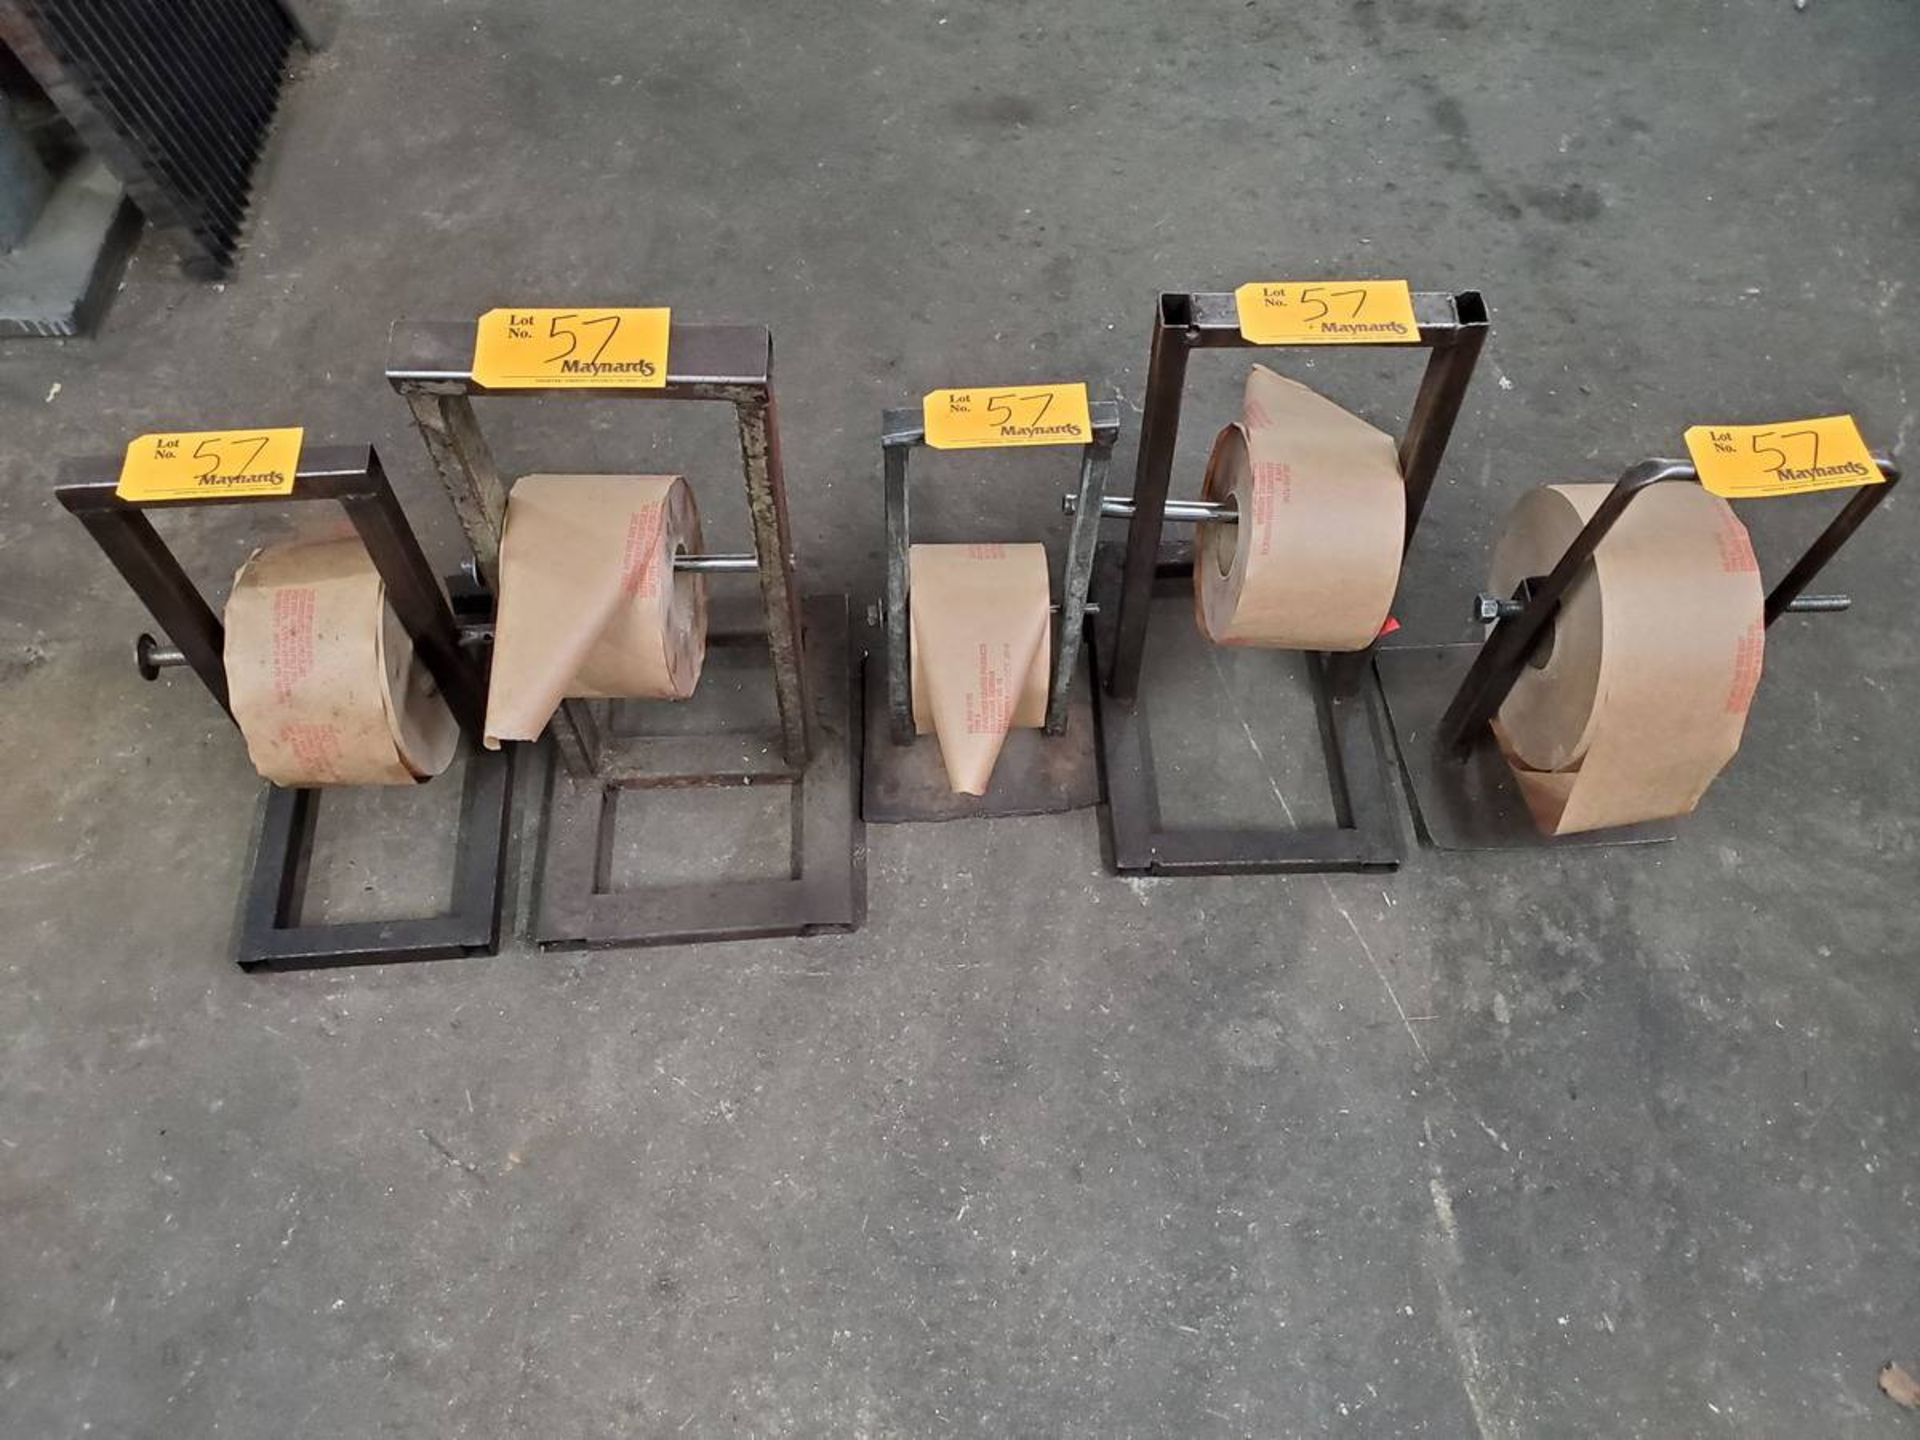 Lot 57 - Mil-PRF-1216 Type II Moisture Barrier Packaging